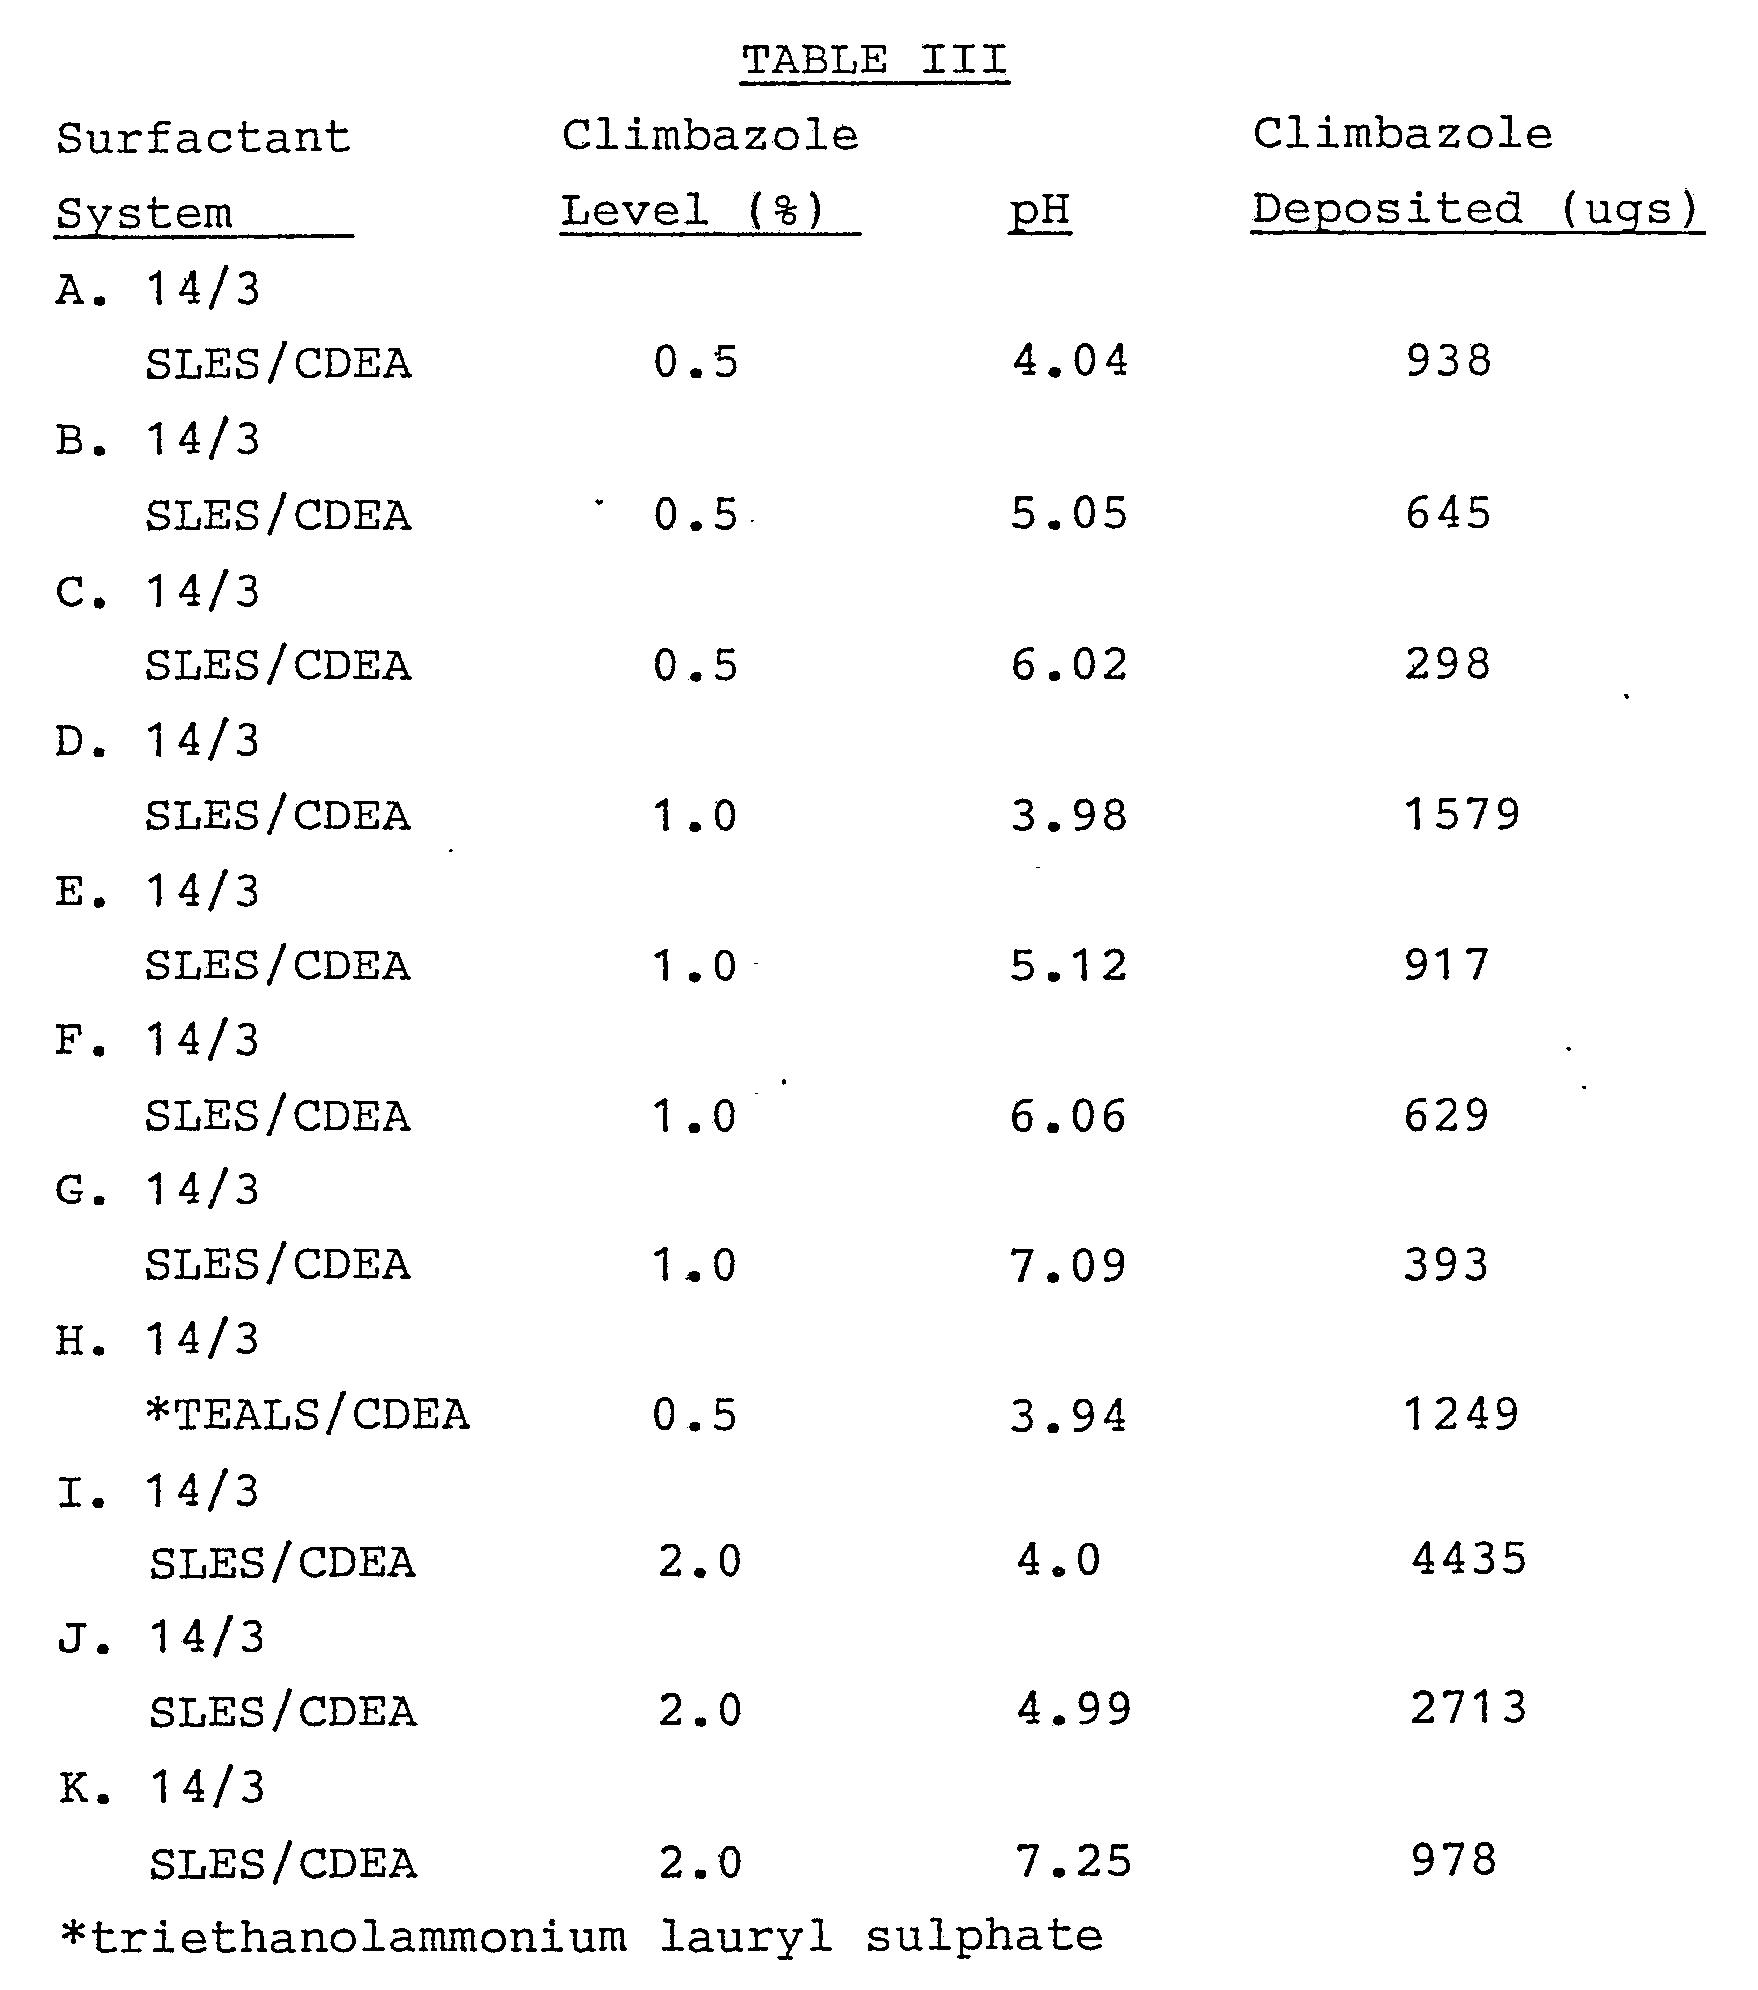 EP0338850A2 - Low pH shampoo containing climbazole - Google